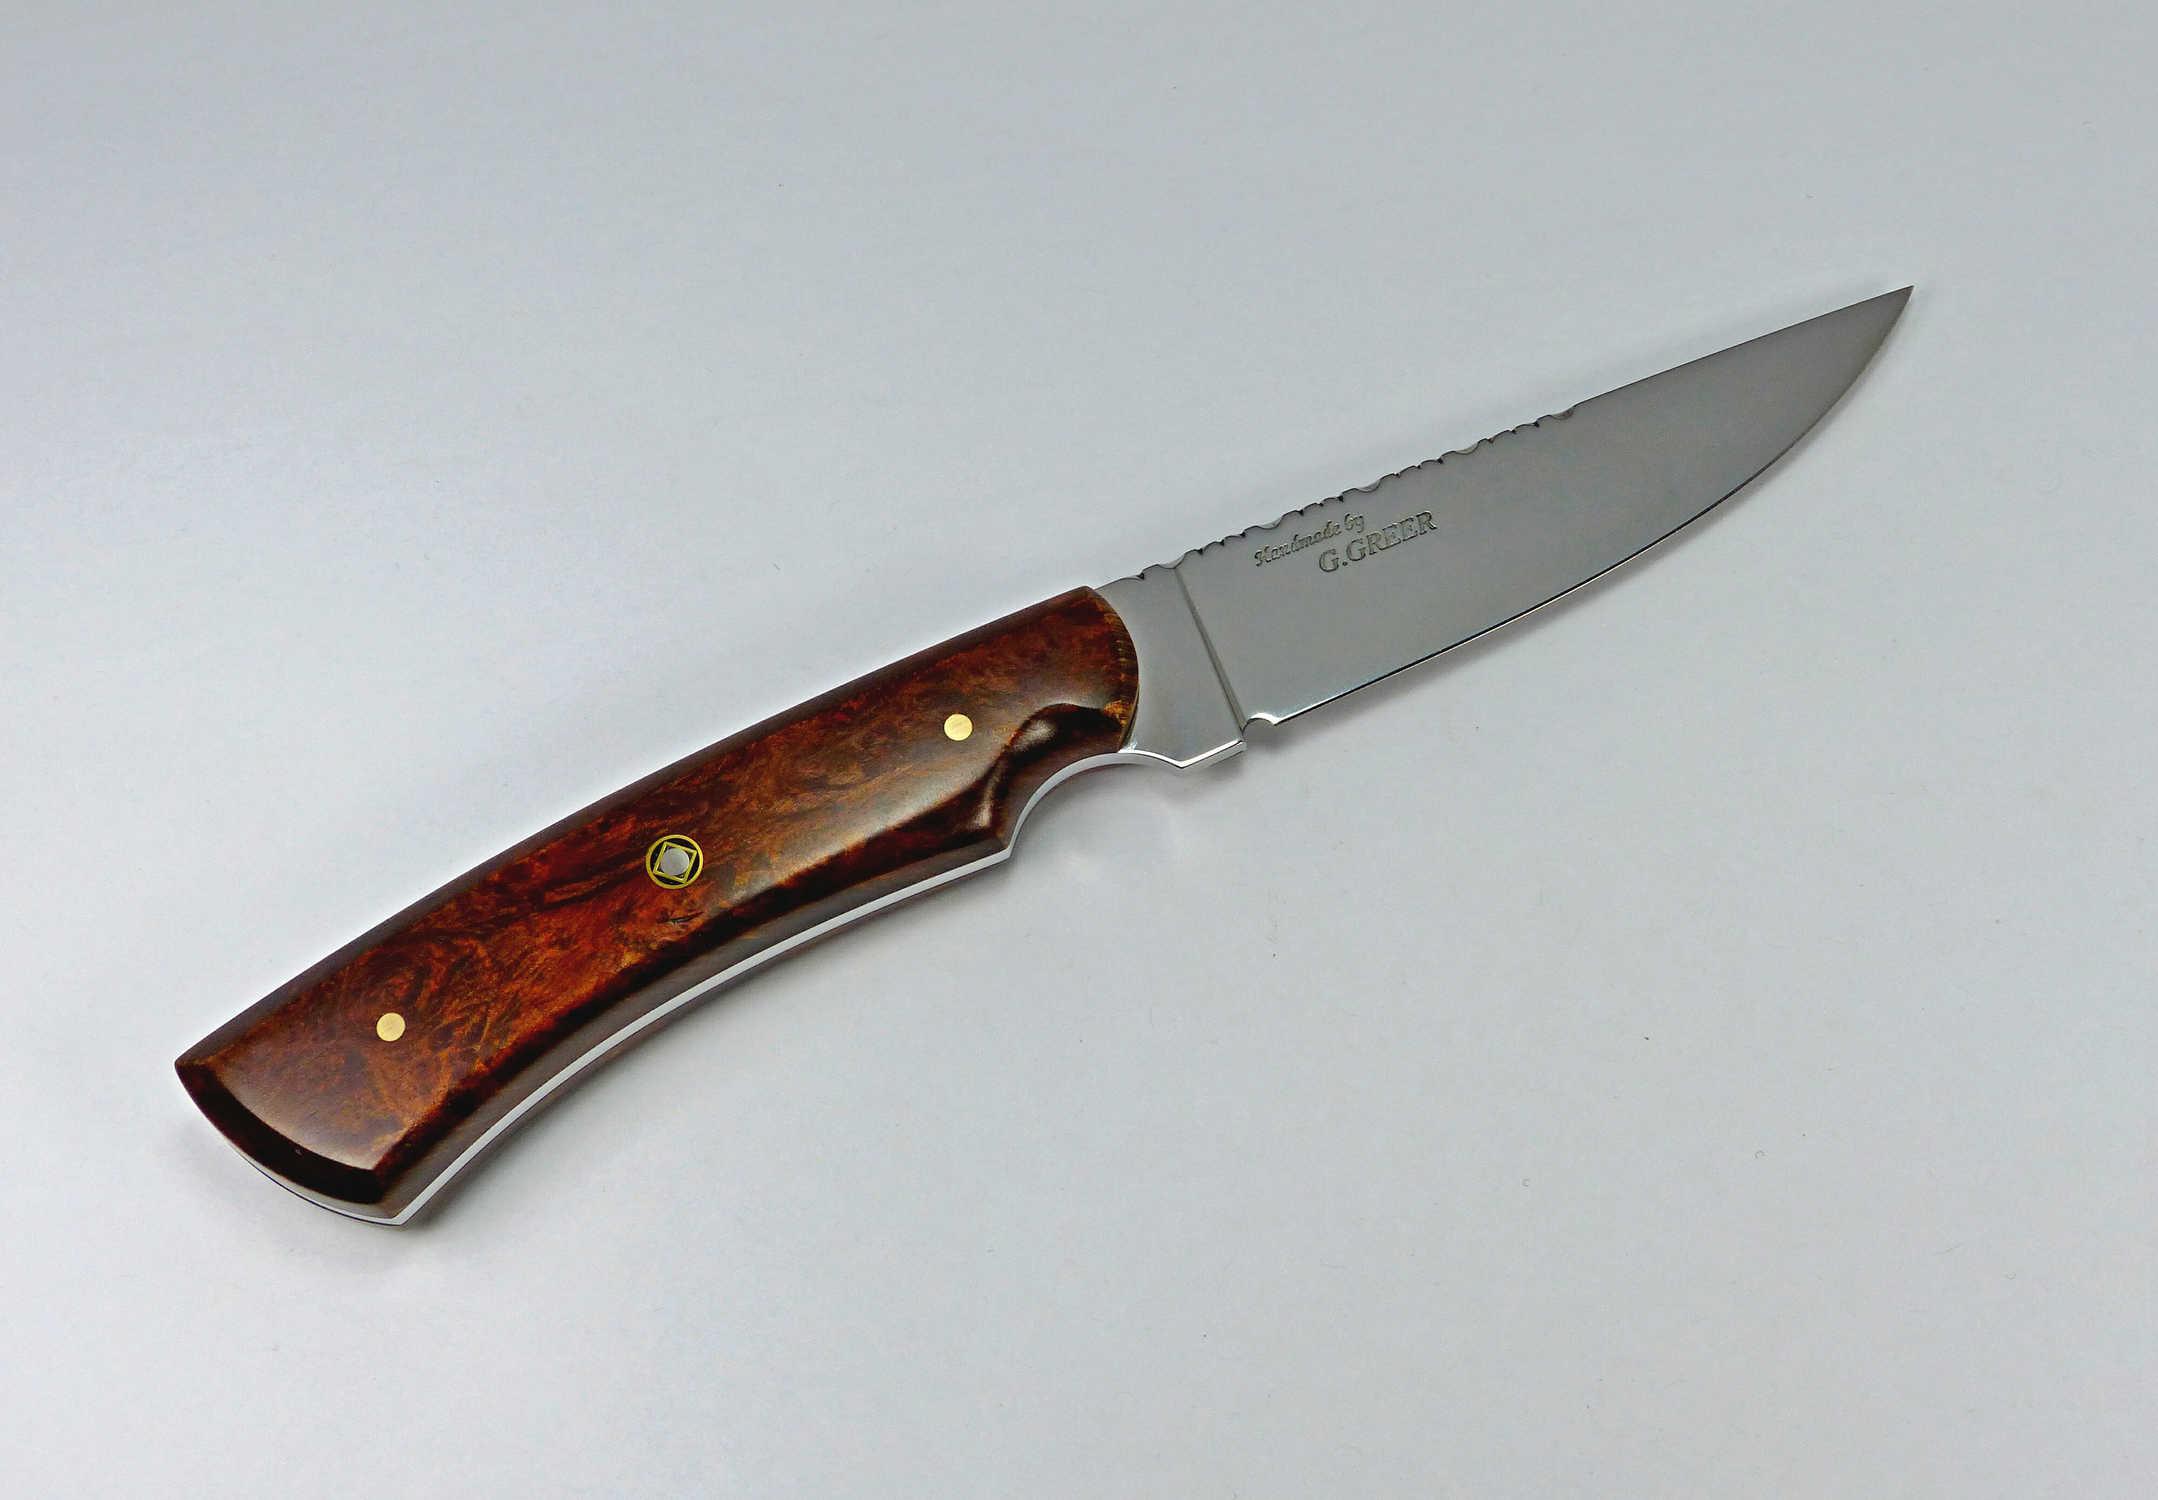 W-8 Walnut Burl Hunting Knife with drop point blade